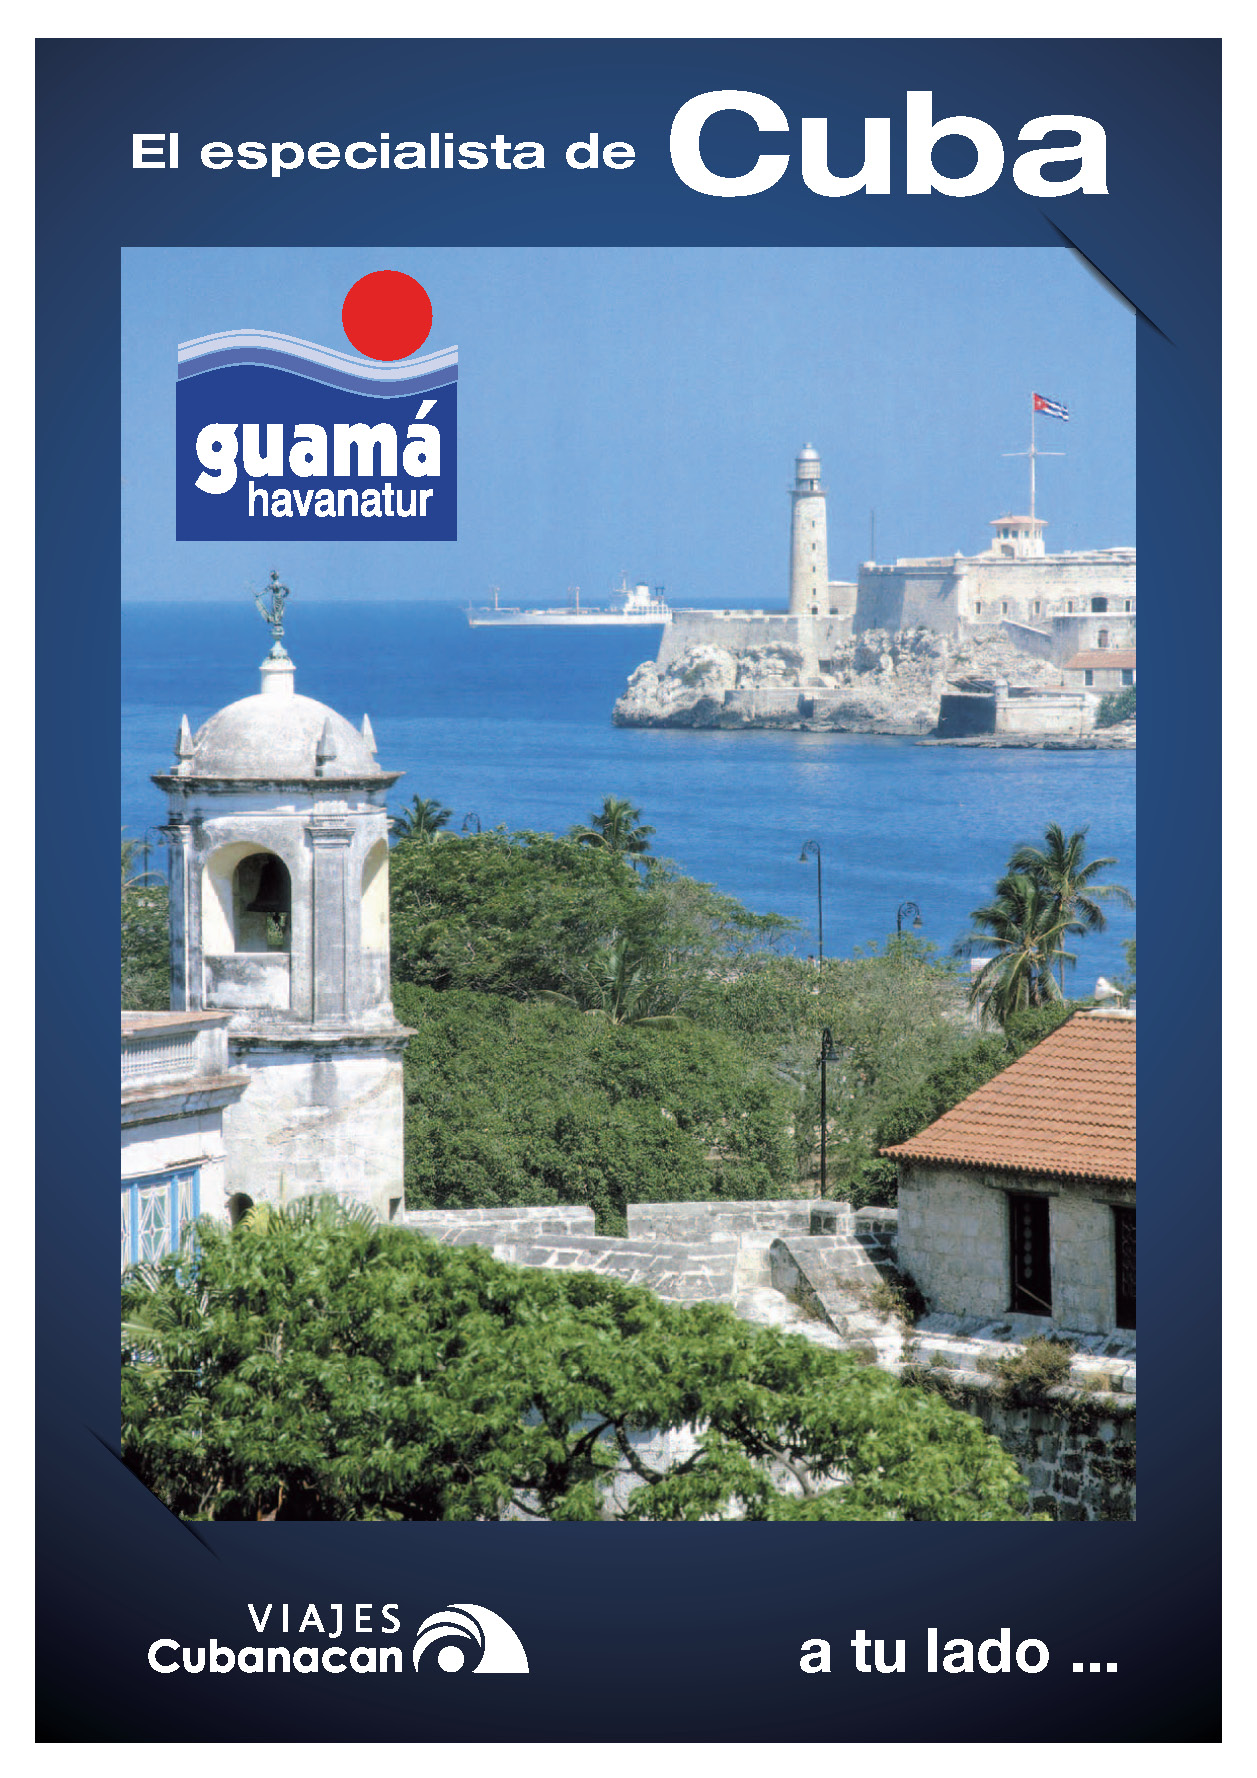 Catalogo Guama Havanatur Cubanacan Cuba Casas Particulares 2021